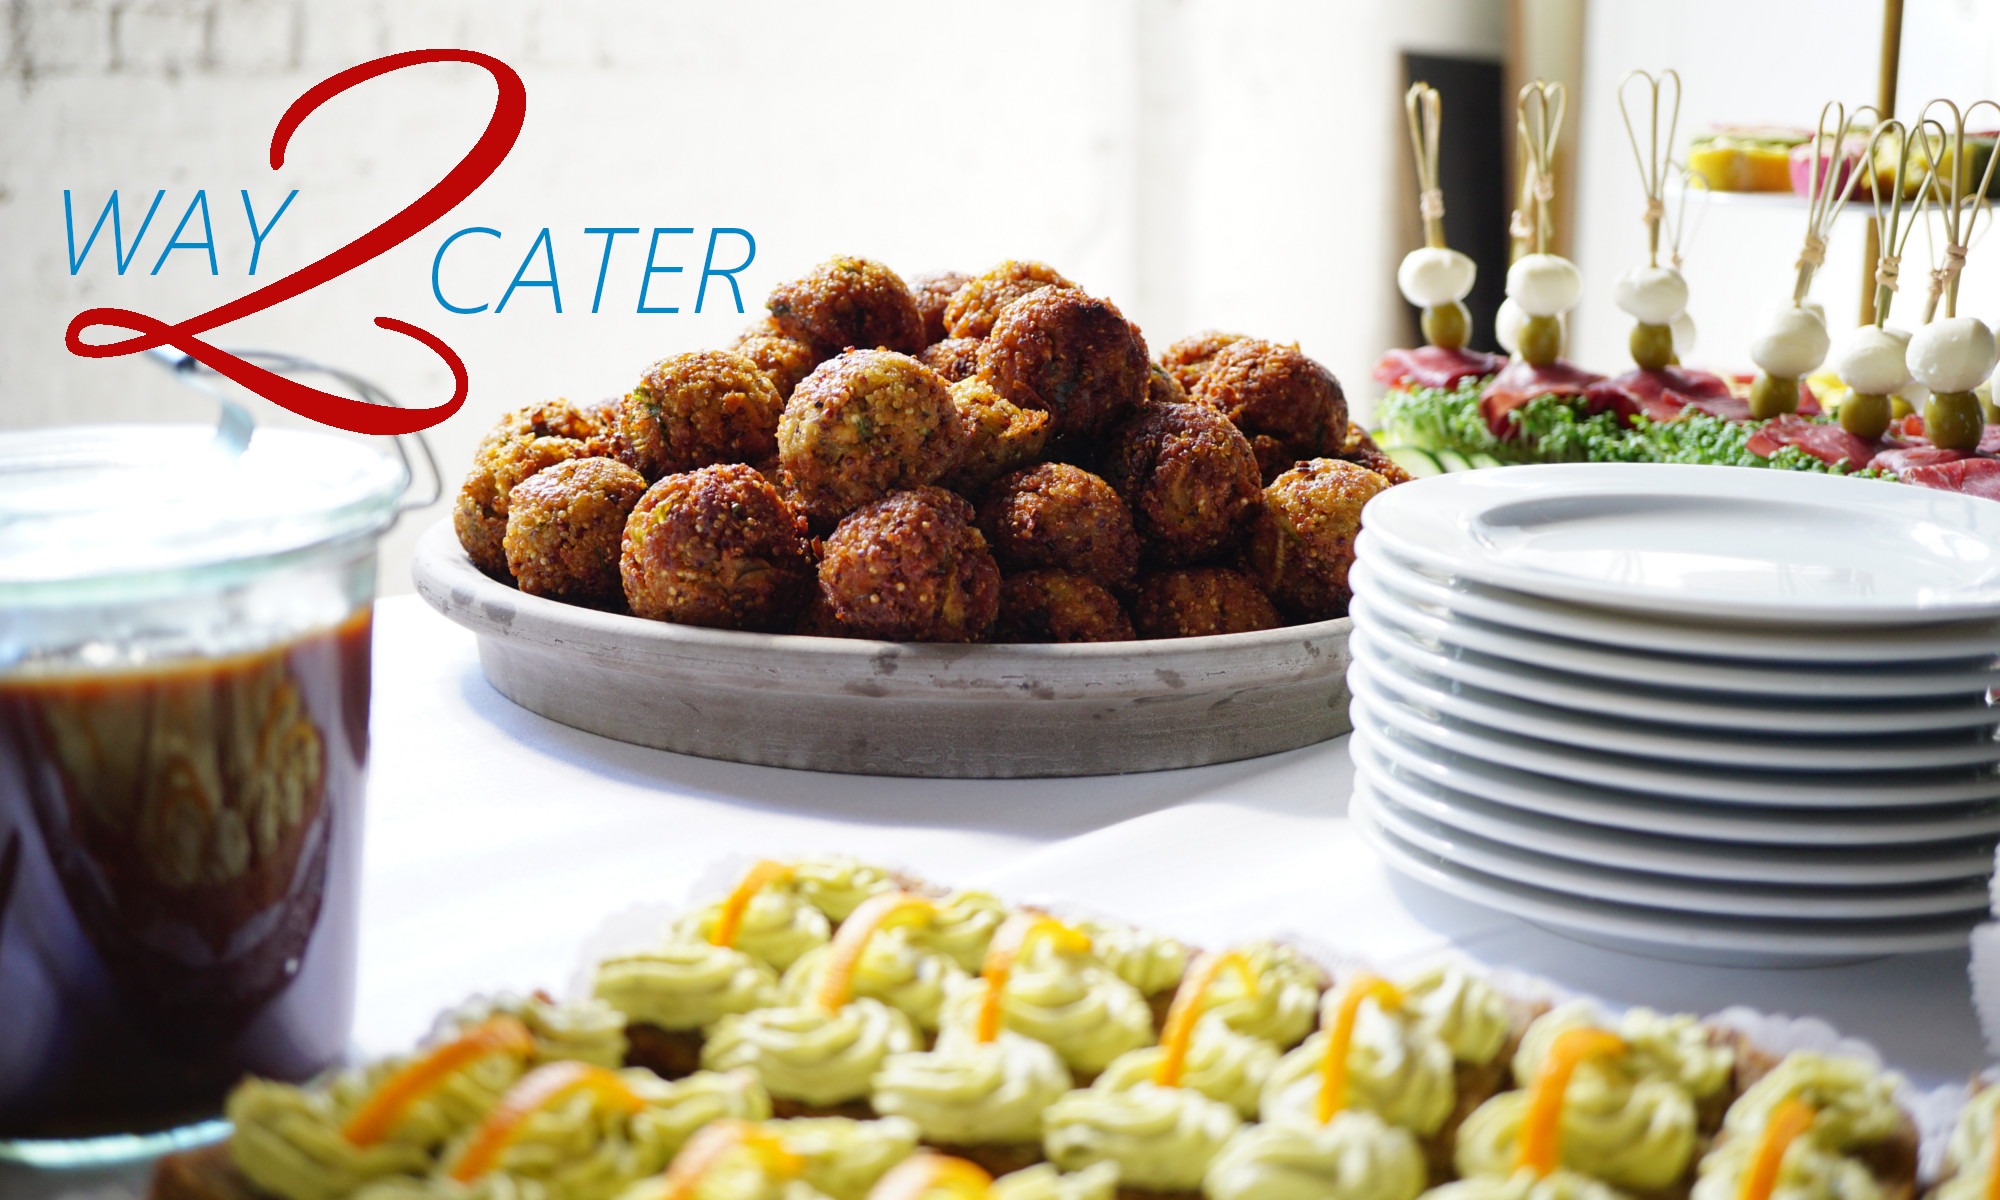 Cateringbuffet mit WAY 2 Quinoaballs, Bresaola-Mozzarella Spießen und Brotpralinen